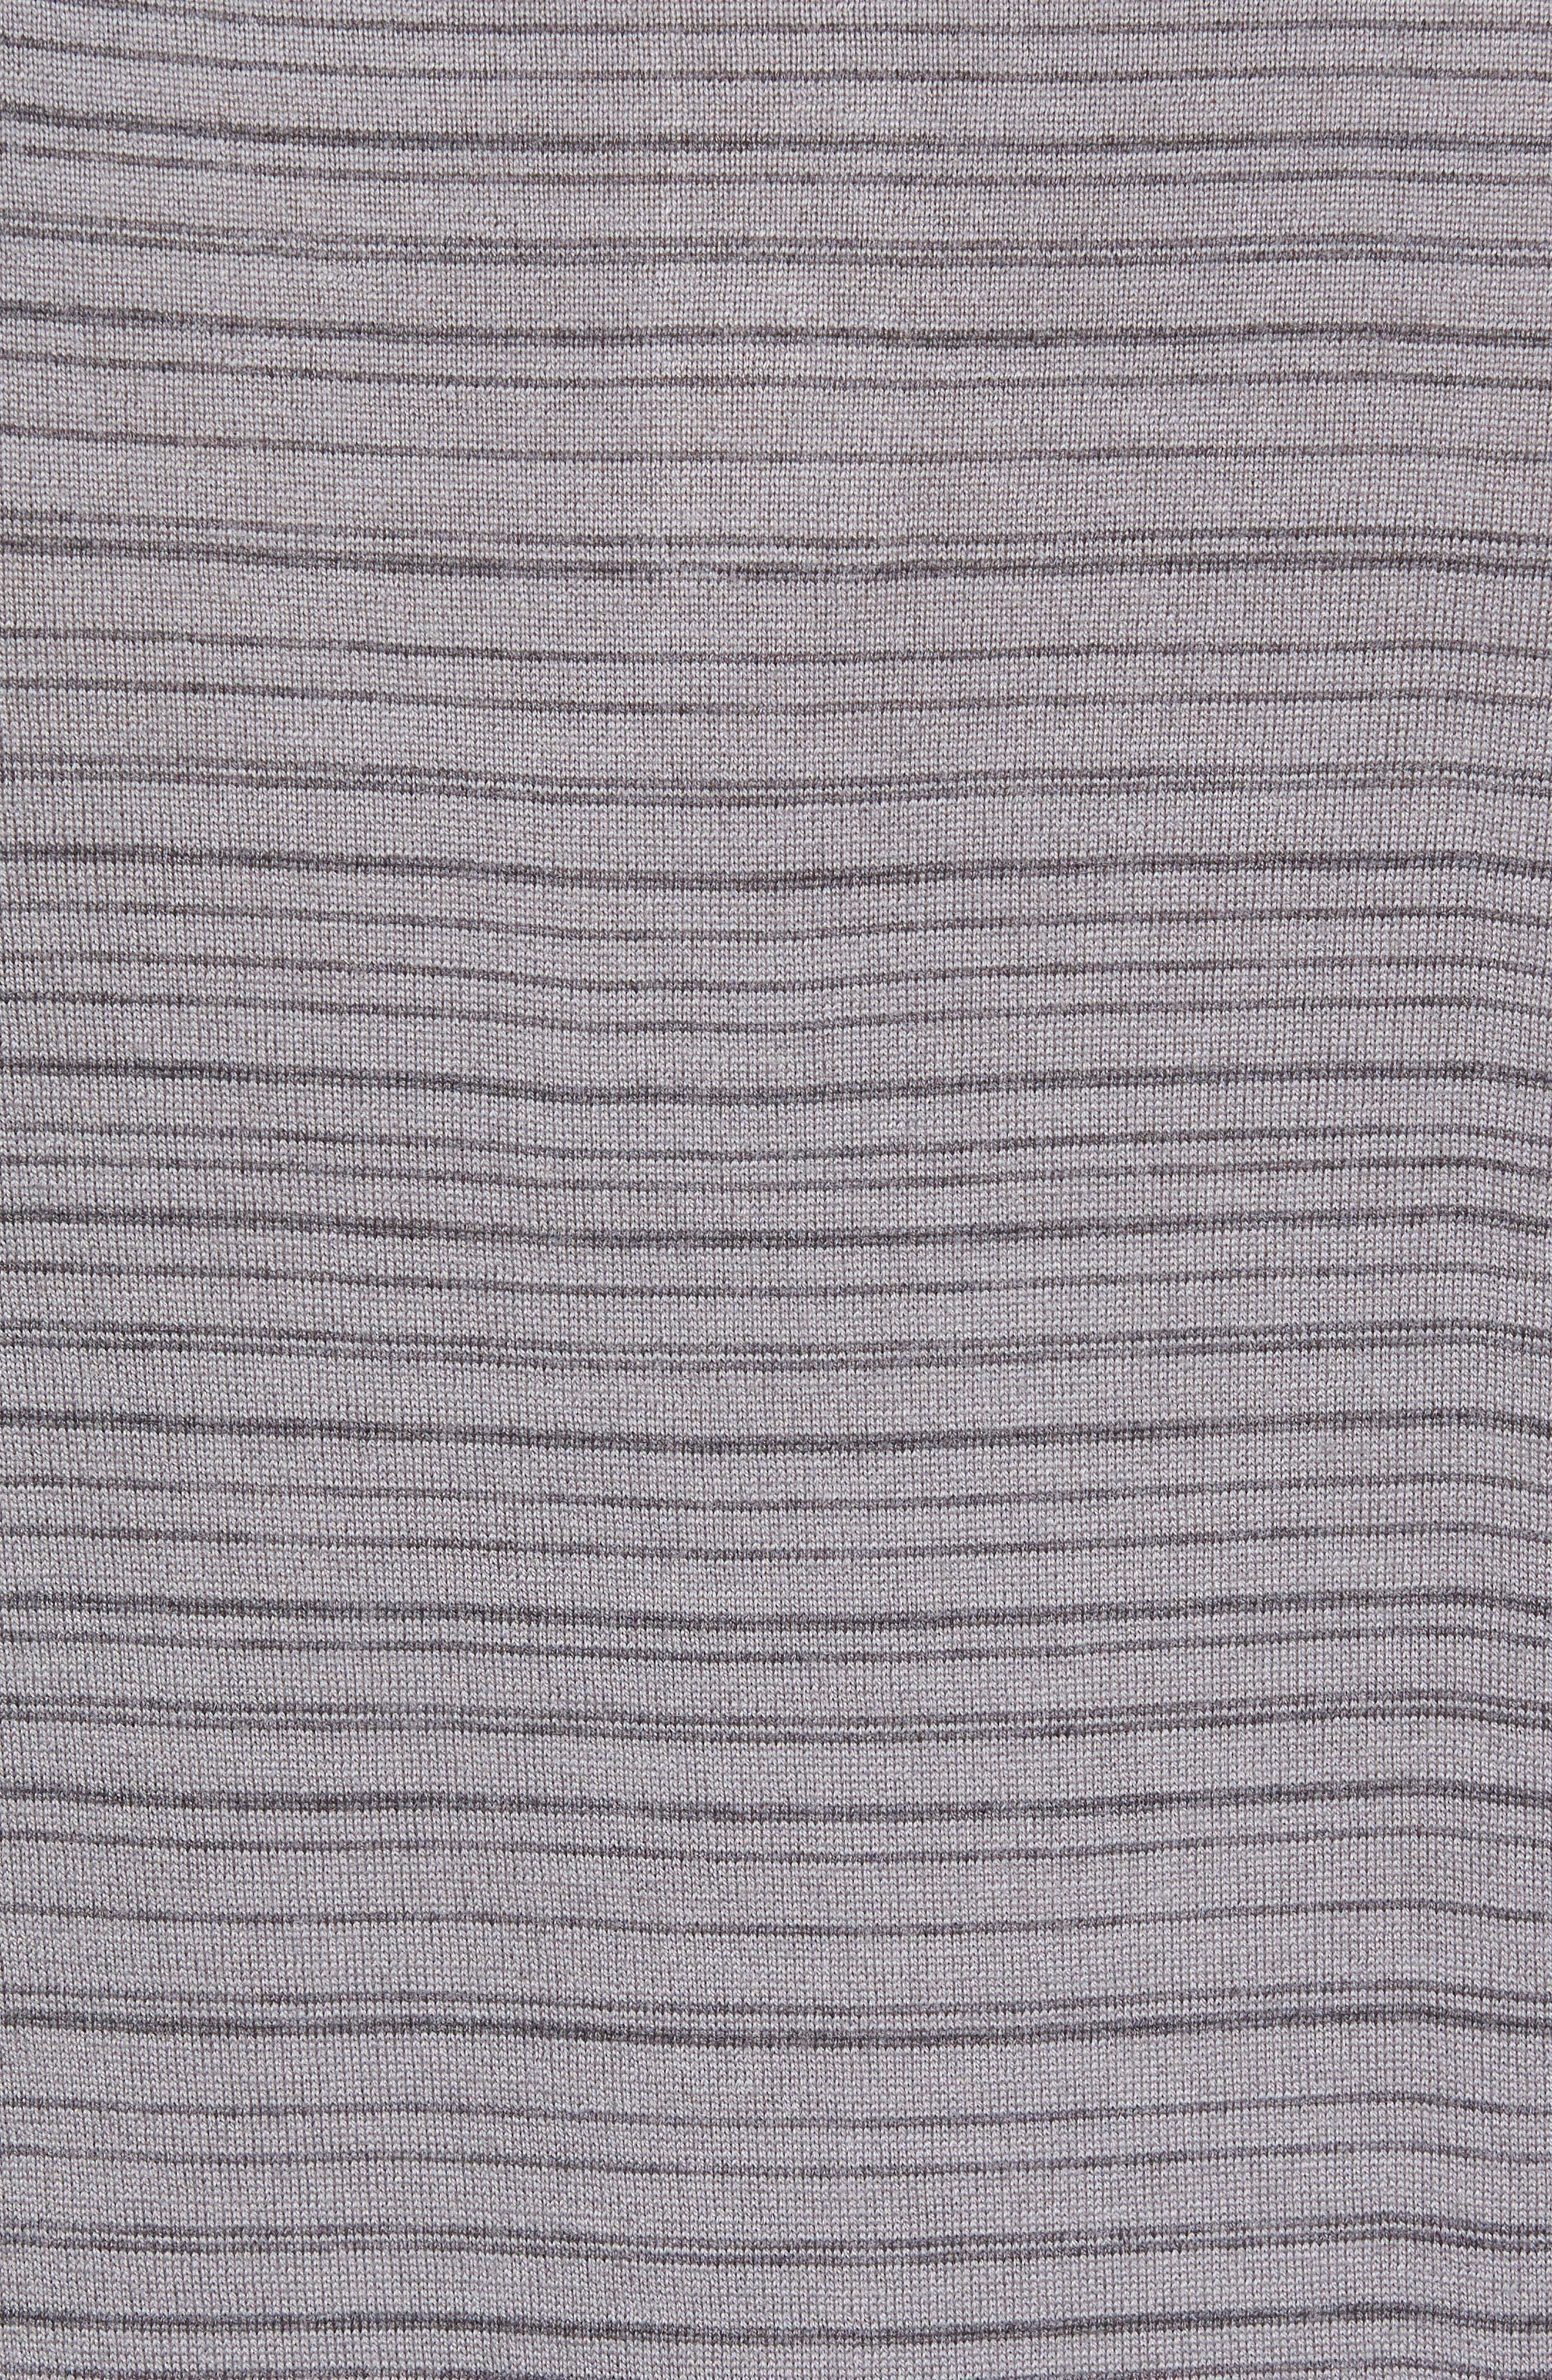 Alternate Image 5  - Gant Stripe Merino Wool Polo Sweater